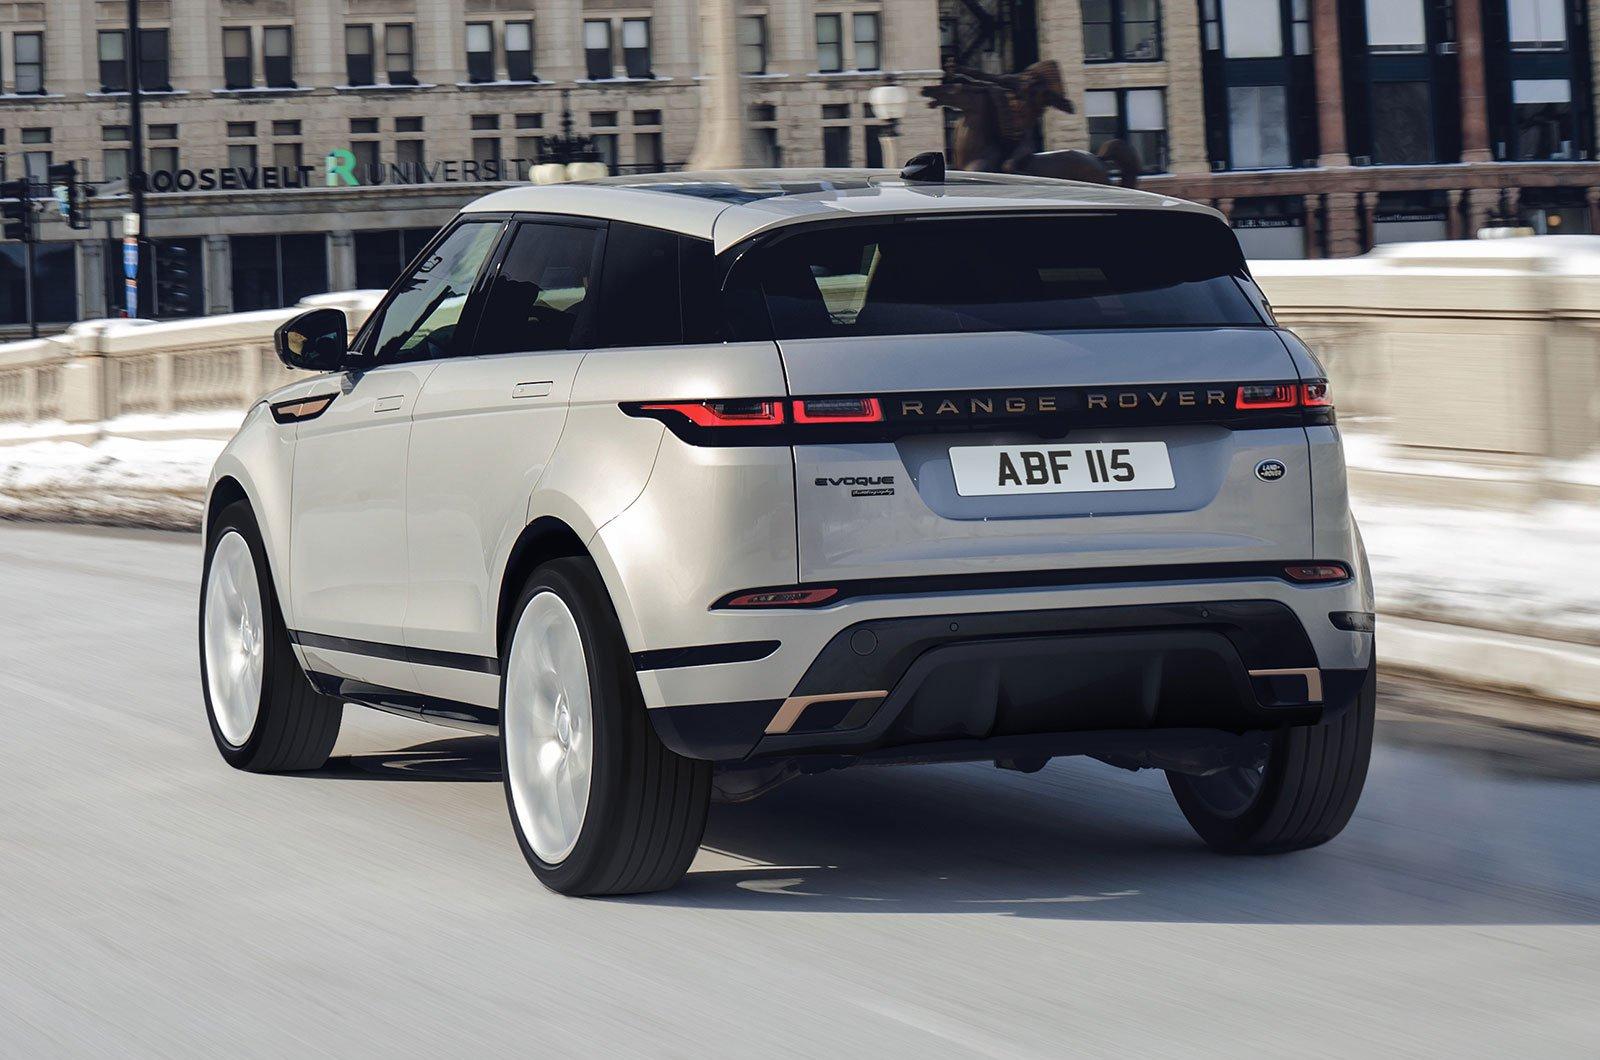 Range Rover Evoque Model Year 2021 rear